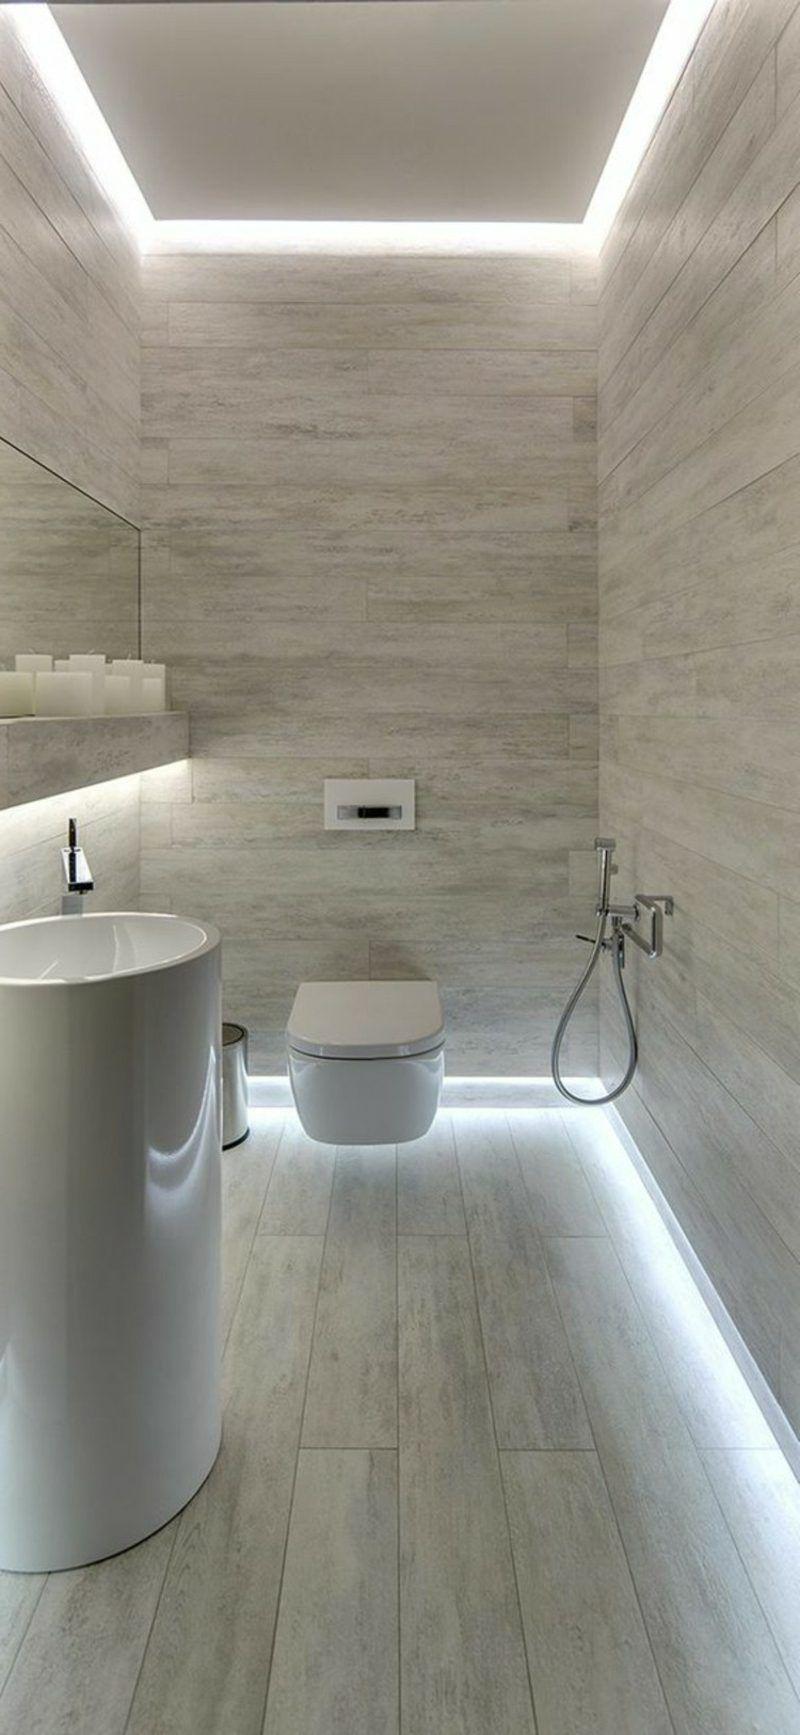 Indirekte Beleuchtung Led Badezimmer Indirekte Beleuchtung Led